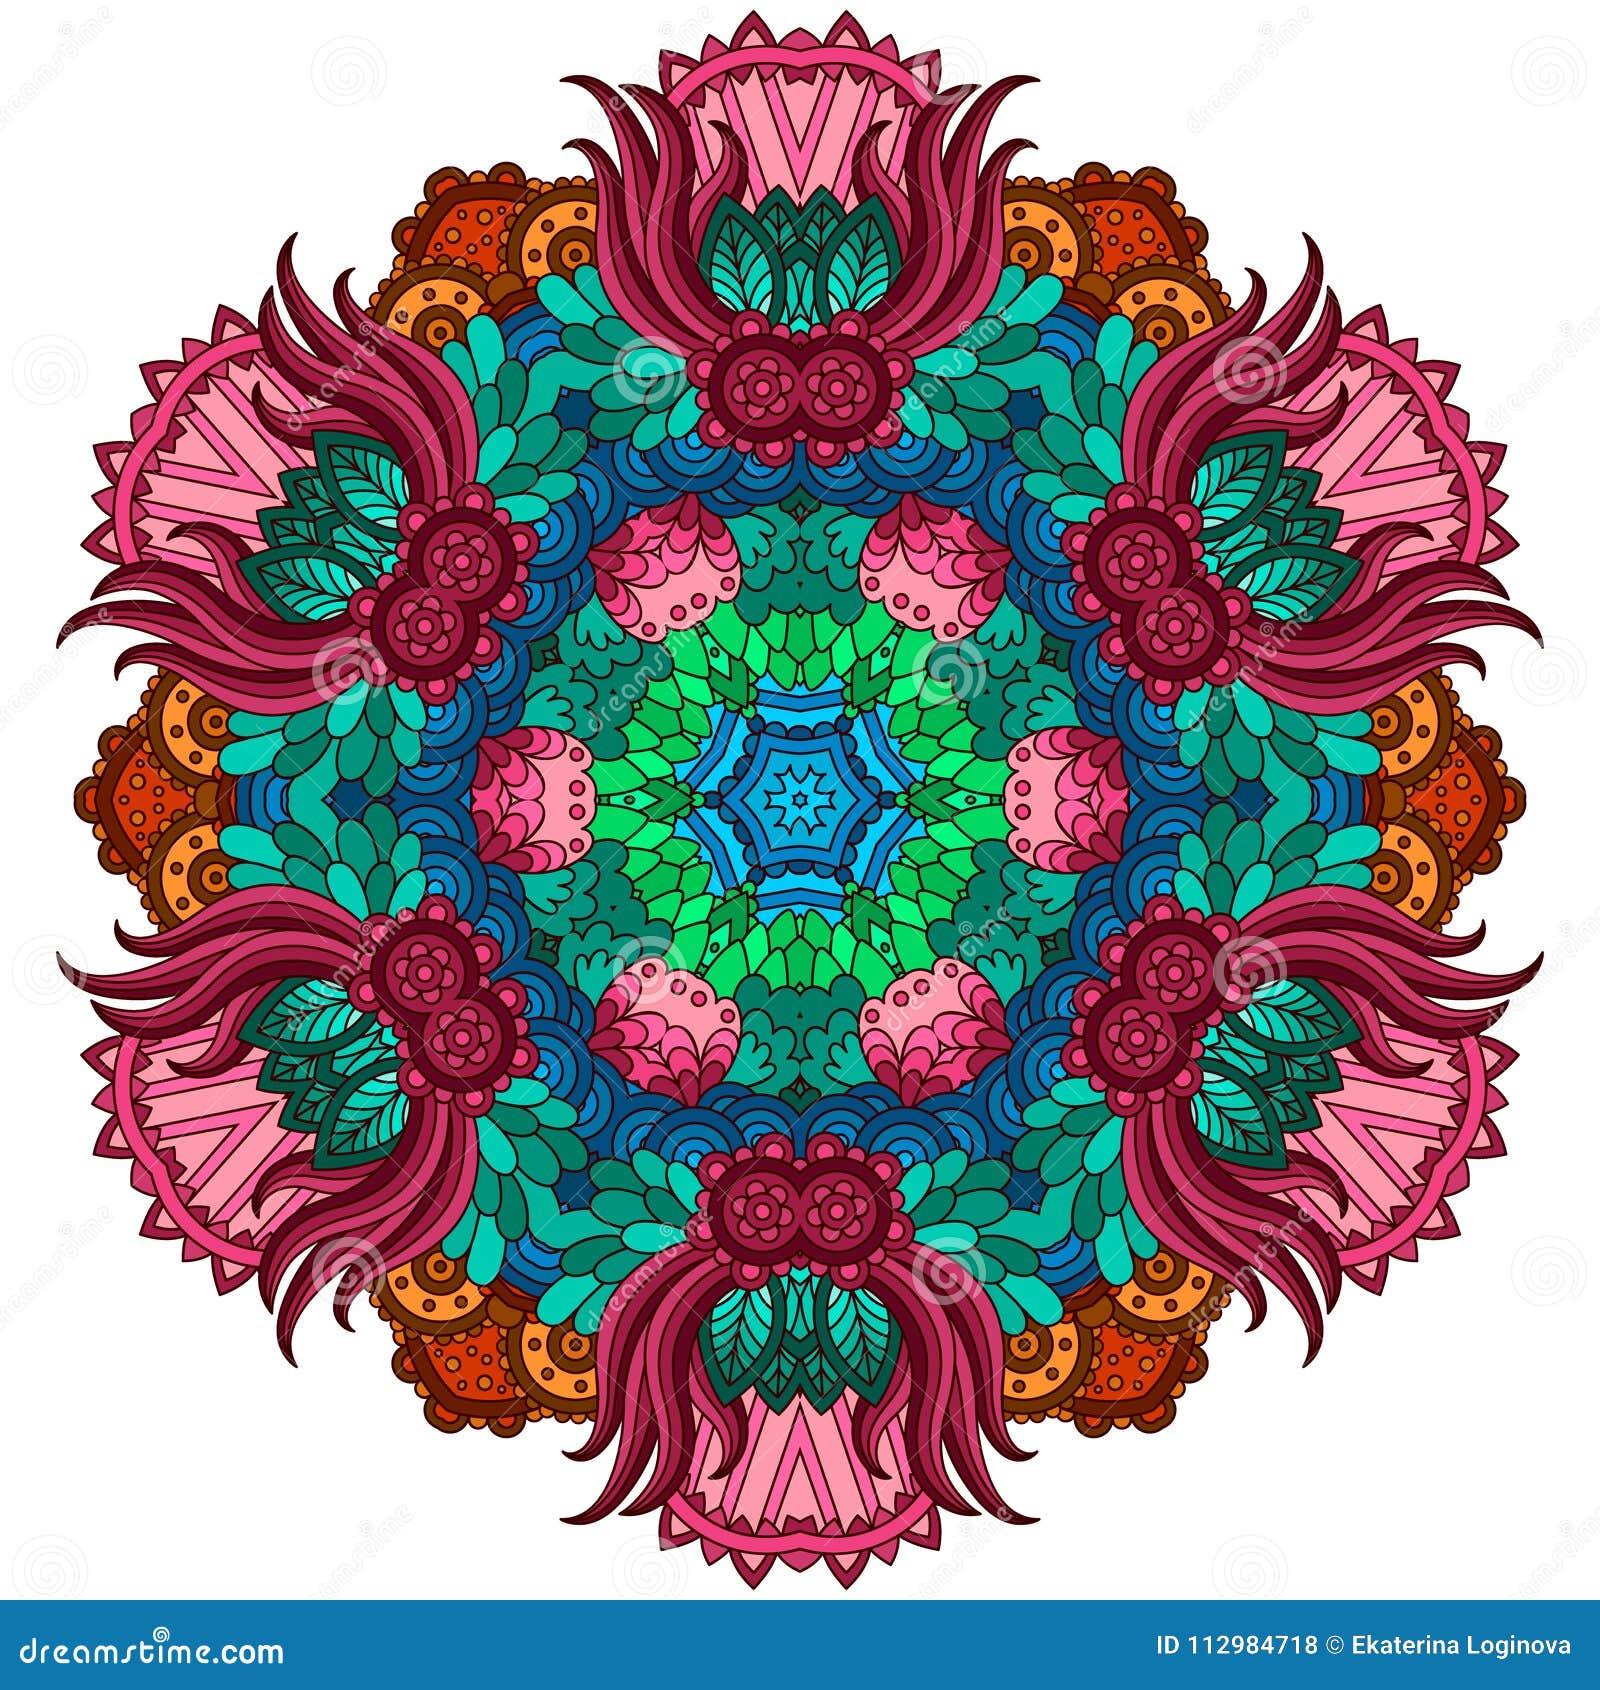 Colorful decorative mandala.